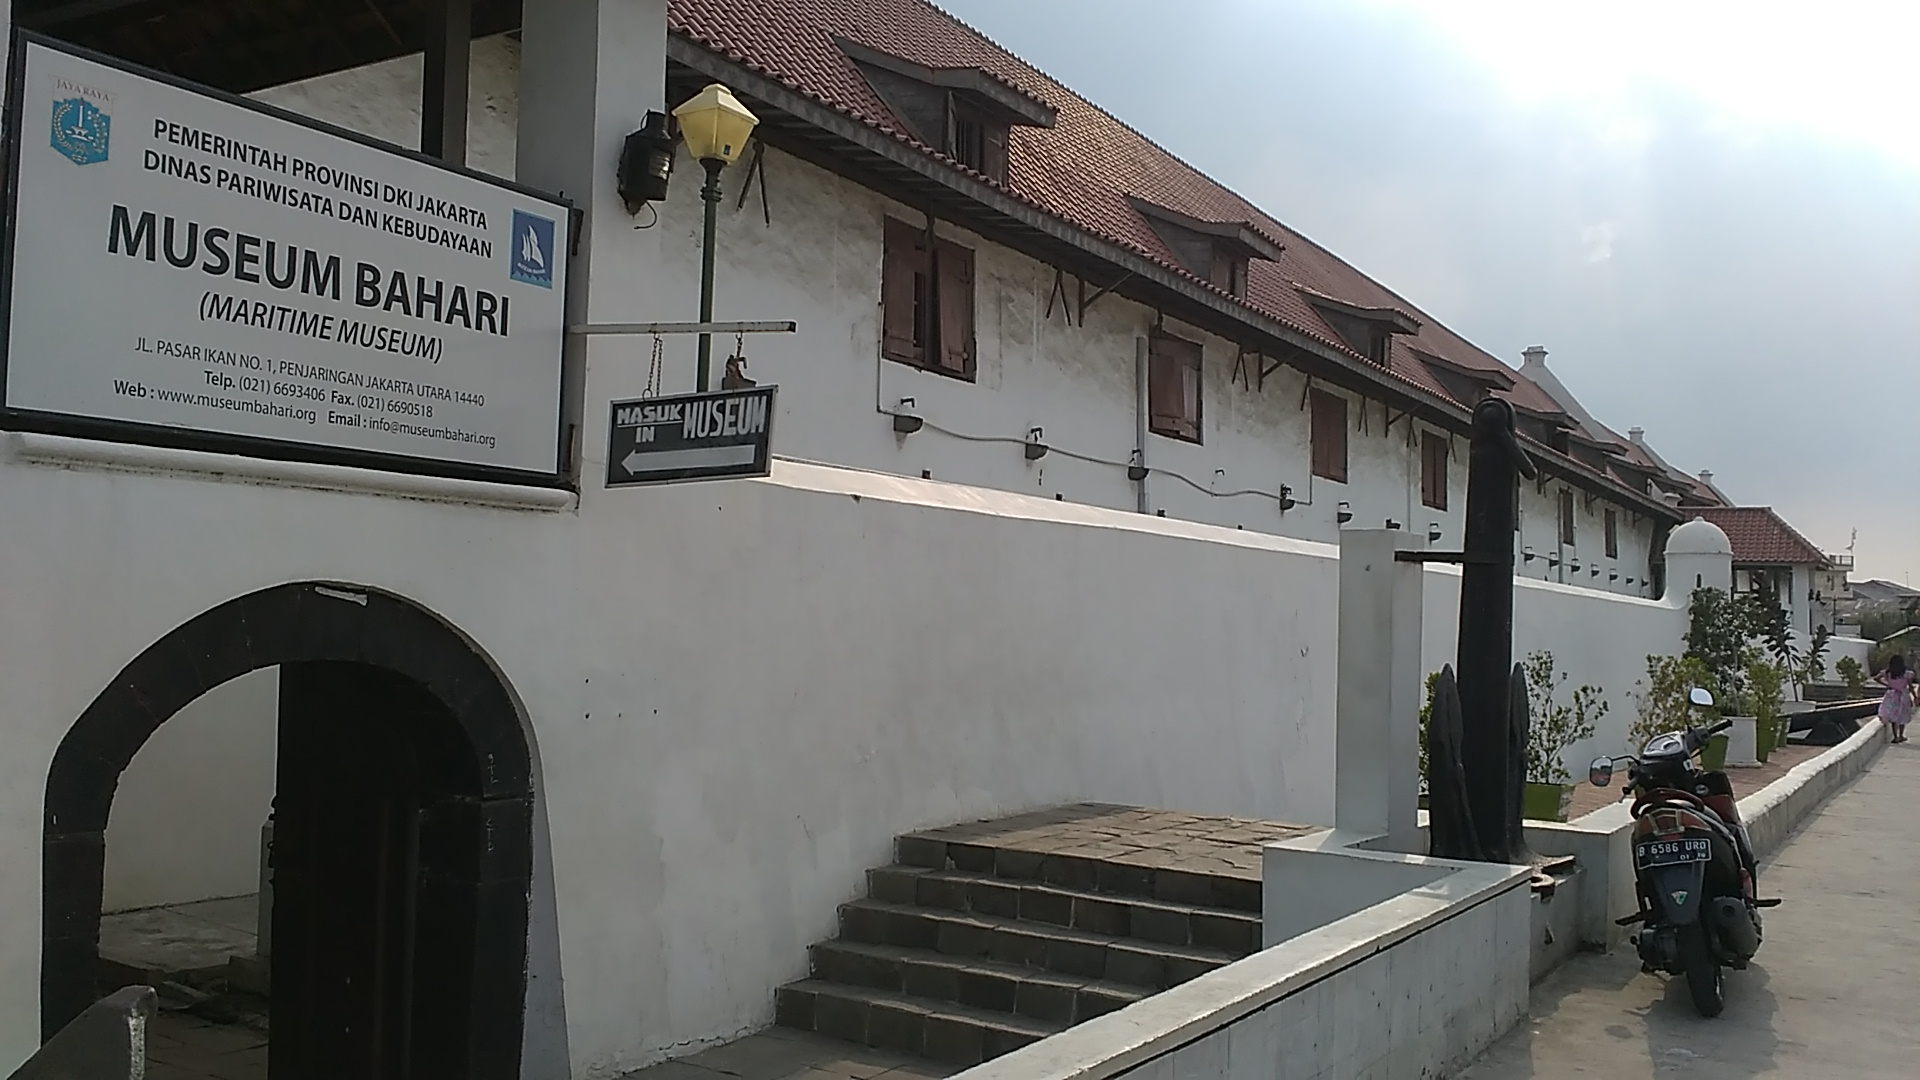 Tempat Wisata Jakarta Maritime Museum, Kota Administrasi Jakarta Barat